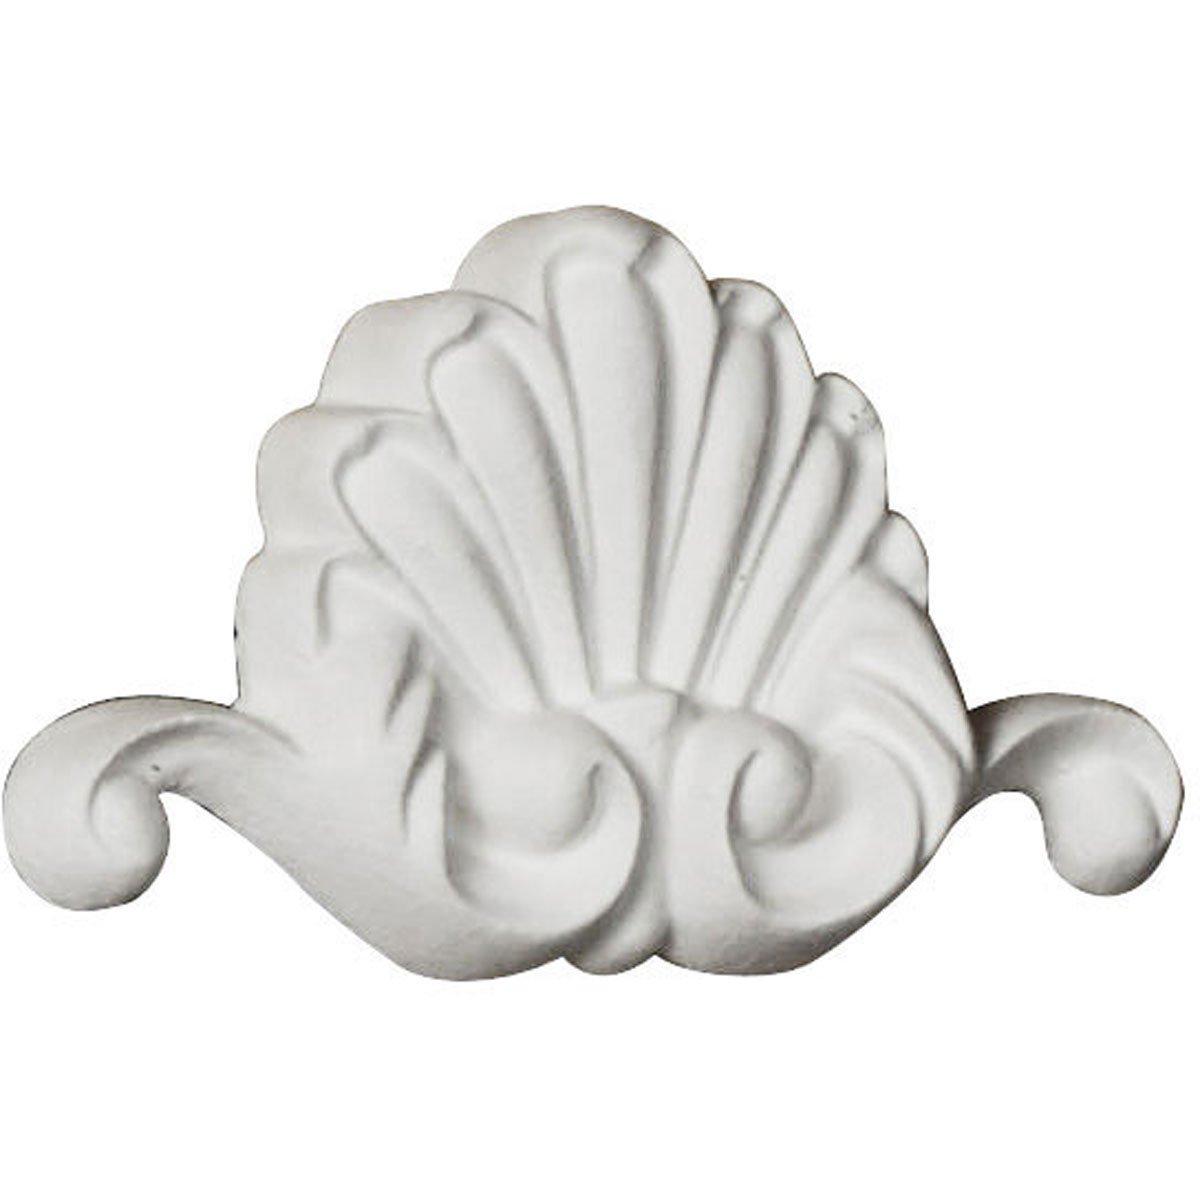 Ekena Millwork ONL03X02X00BO 3''W x 1 3/4''H x 3/8''P Bordeaux Shell Onlay White by Ekena Millwork (Image #3)